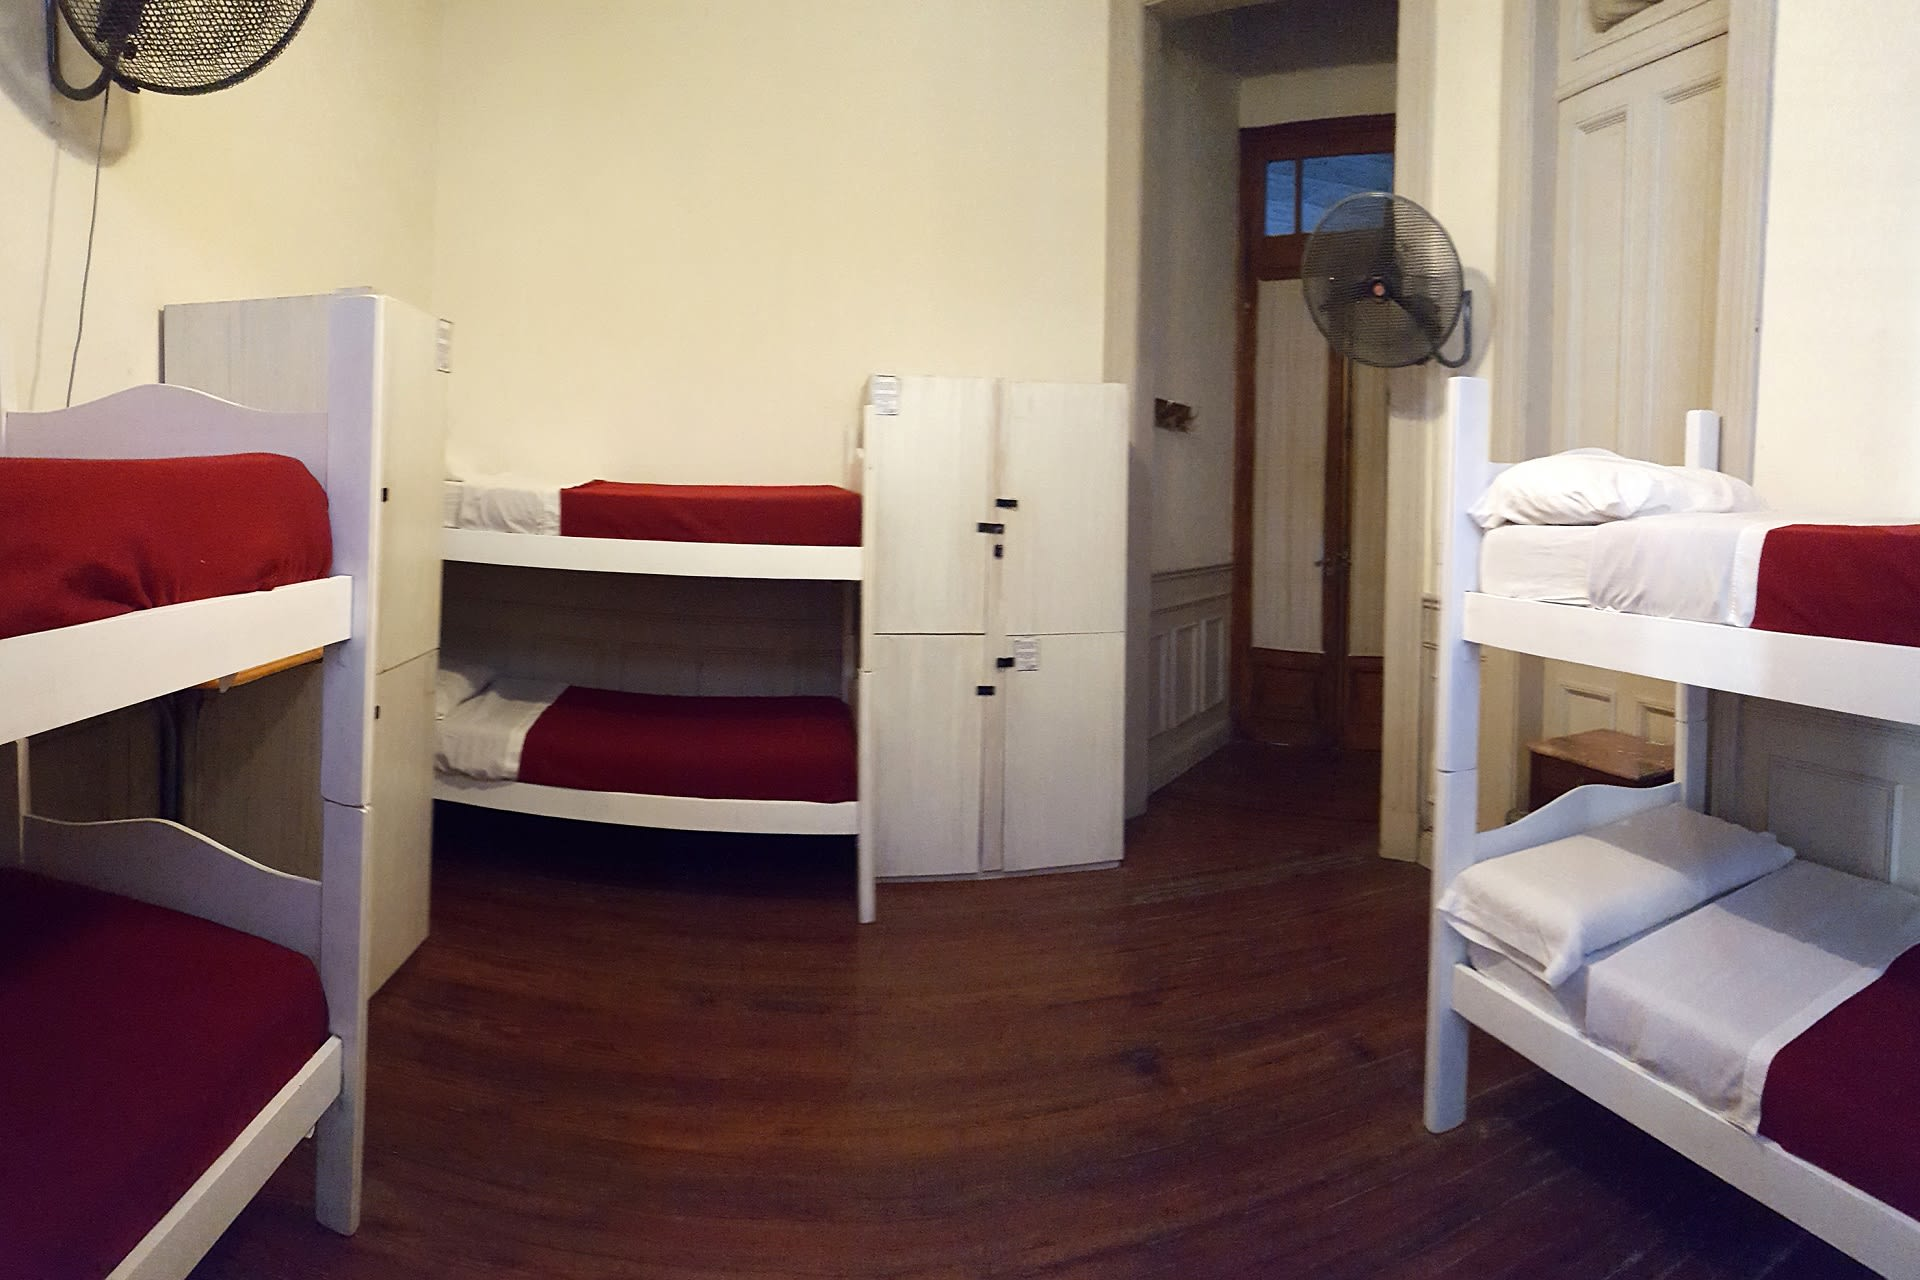 HOSTEL - Voyage Recoleta Hostel